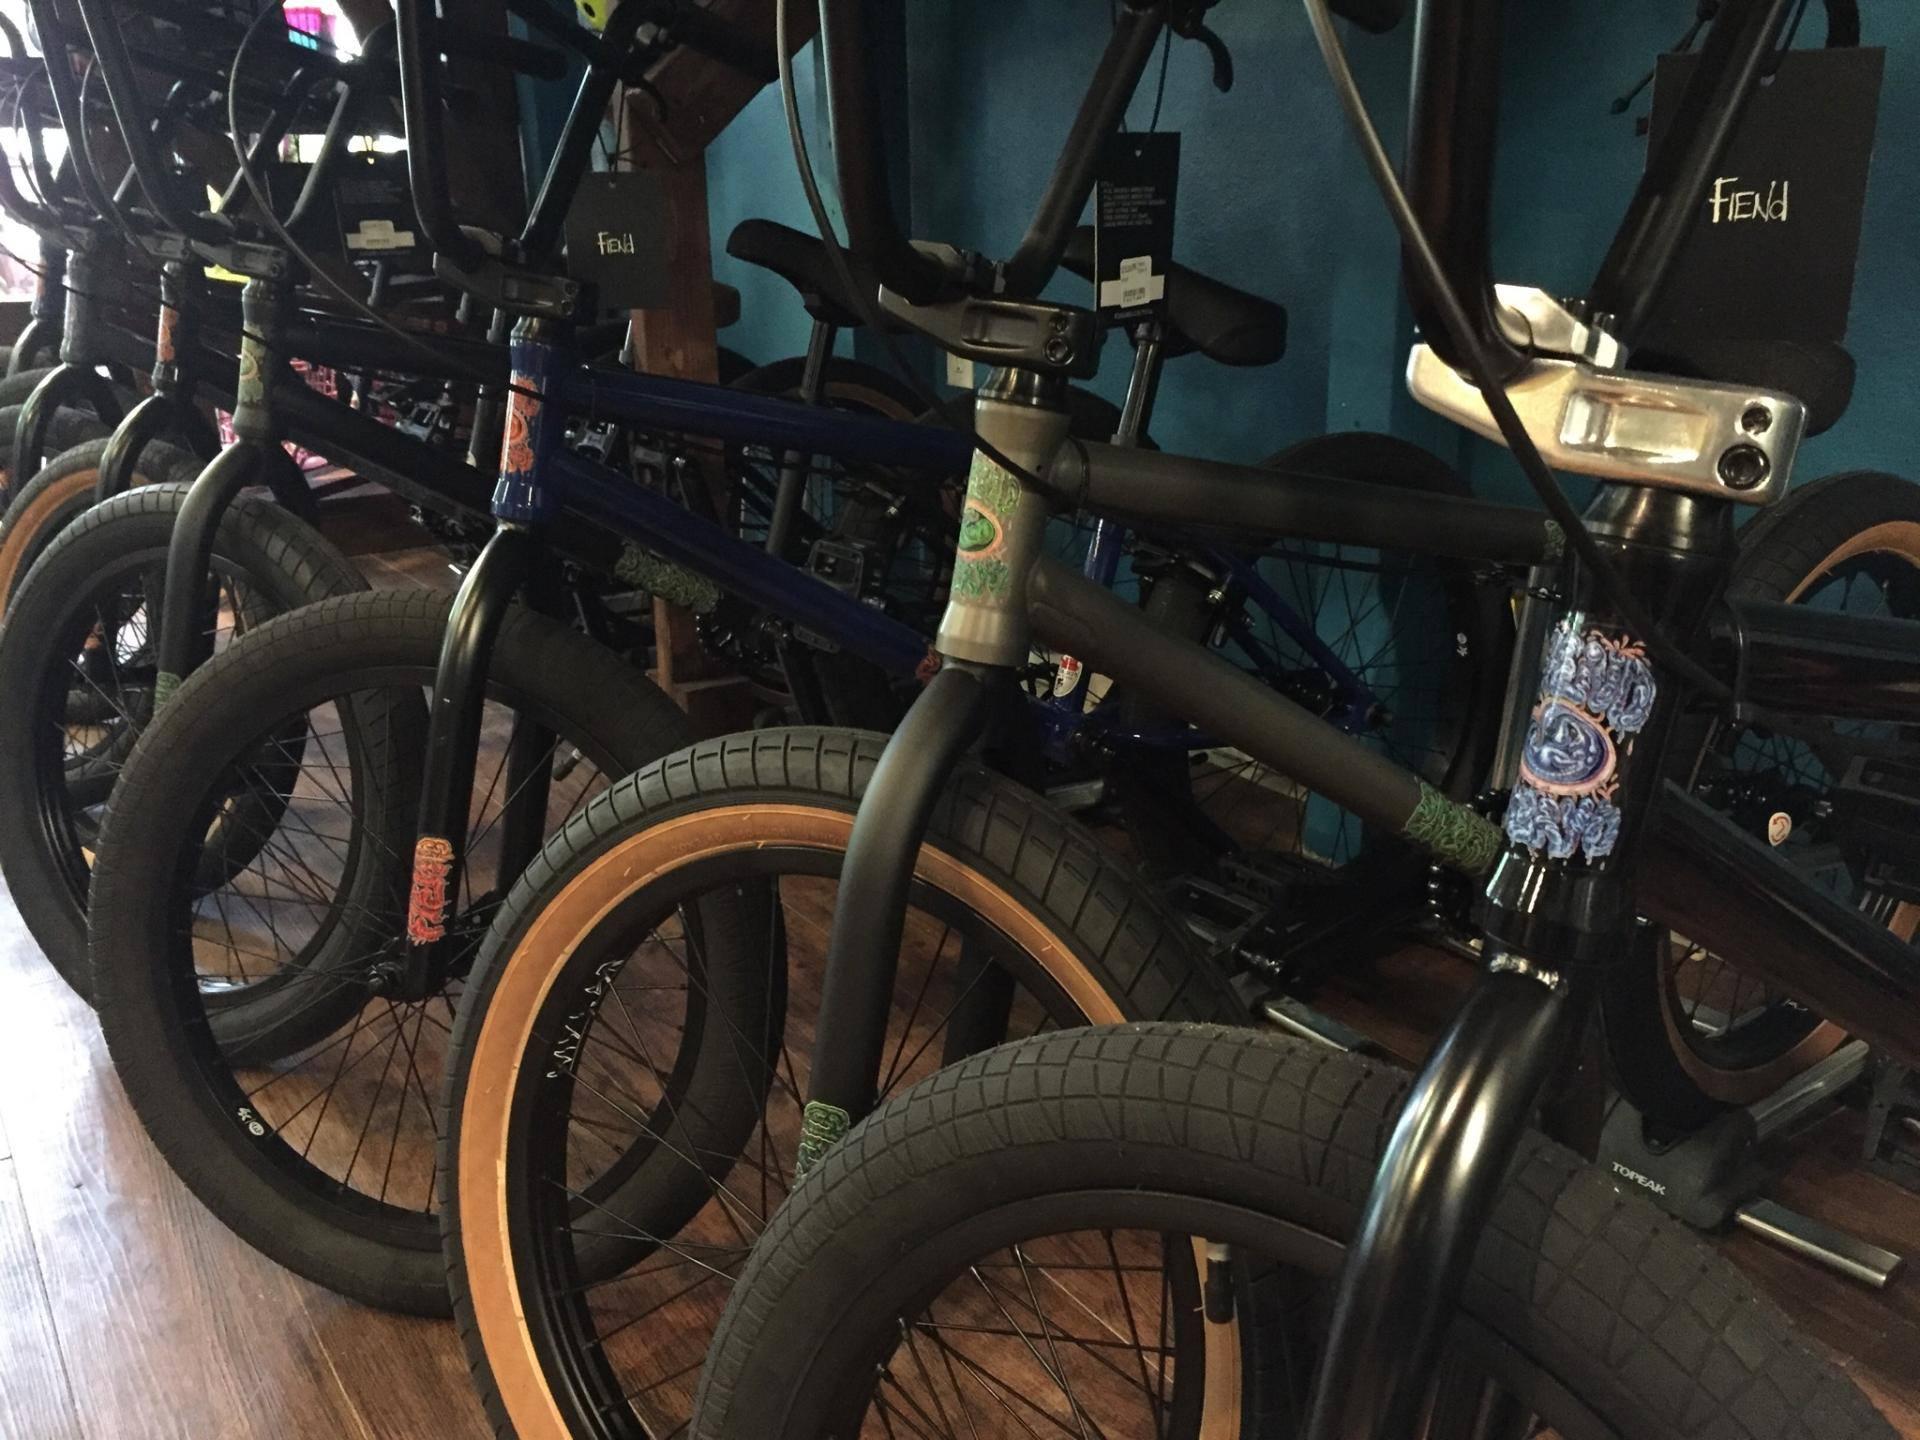 BMX Bikes from Kink, Subrosa & Fiend